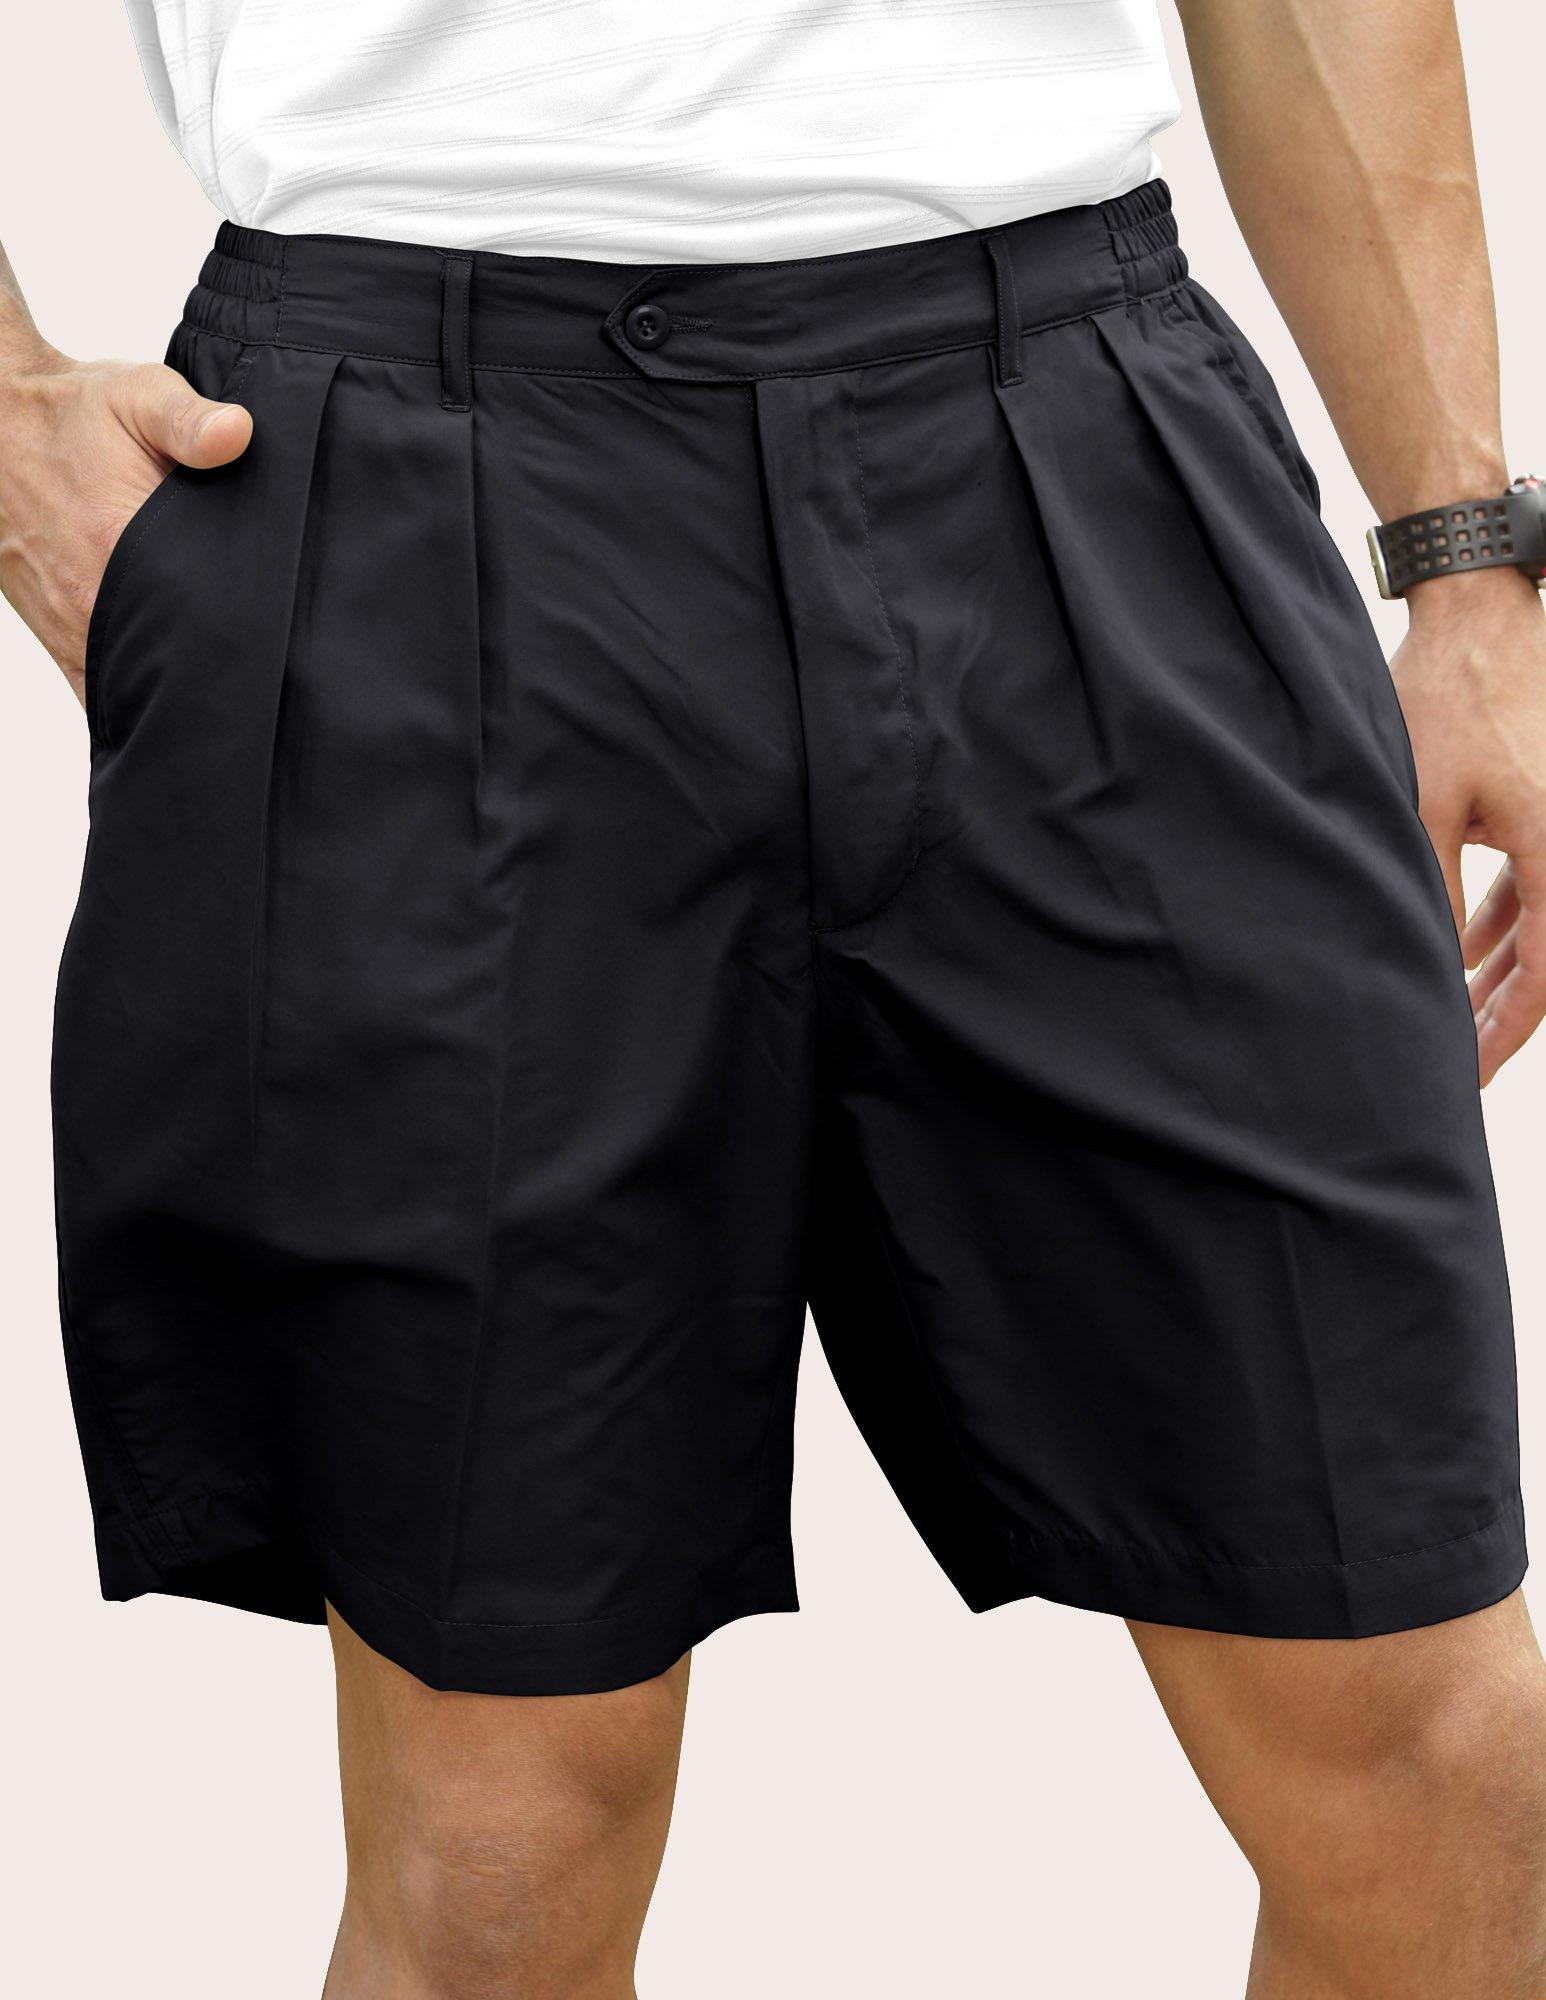 Pro Celebrity Men's Lightweight MF636 Pleated Shorts (38, Black)